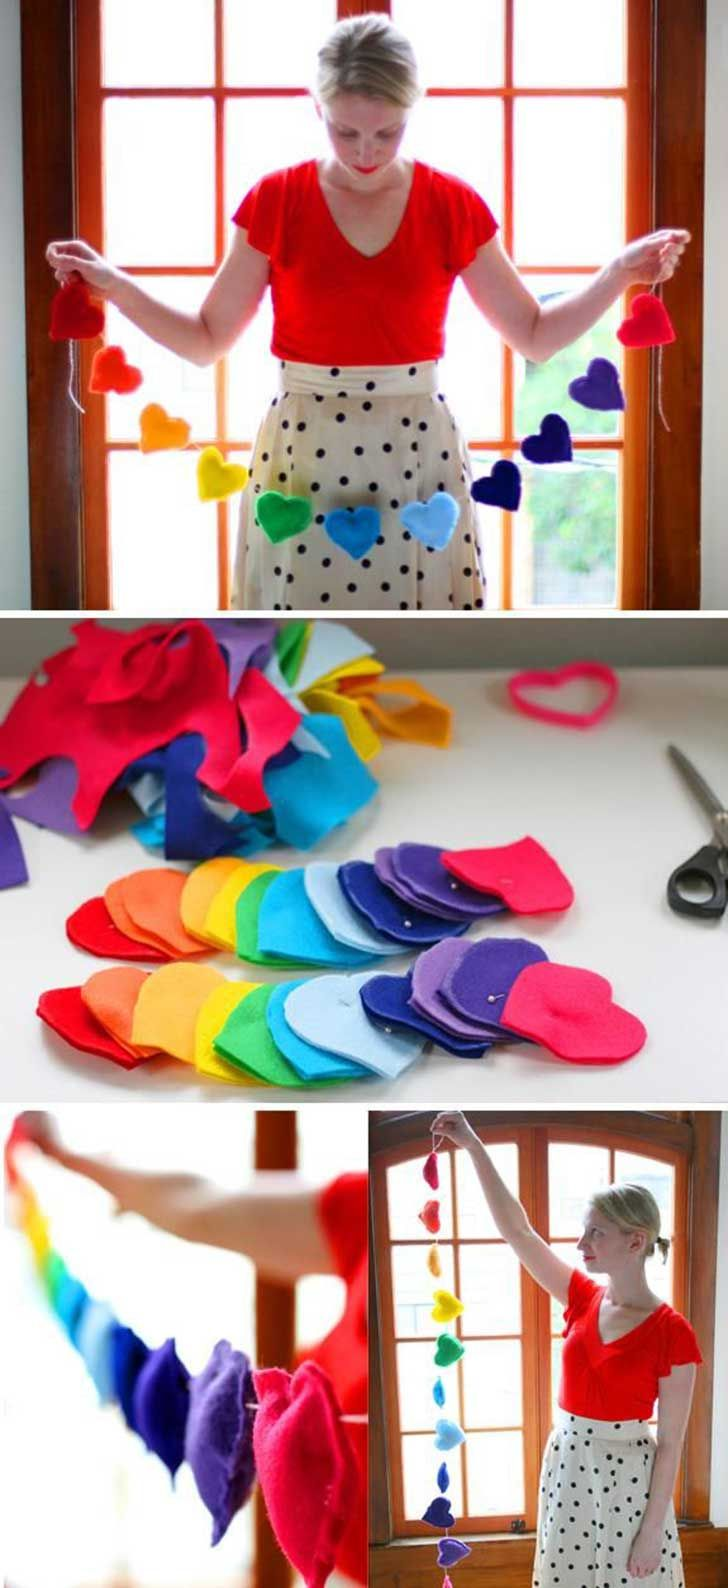 25 asombrosos accesorios para amantes de los arcoíris   Upsocl